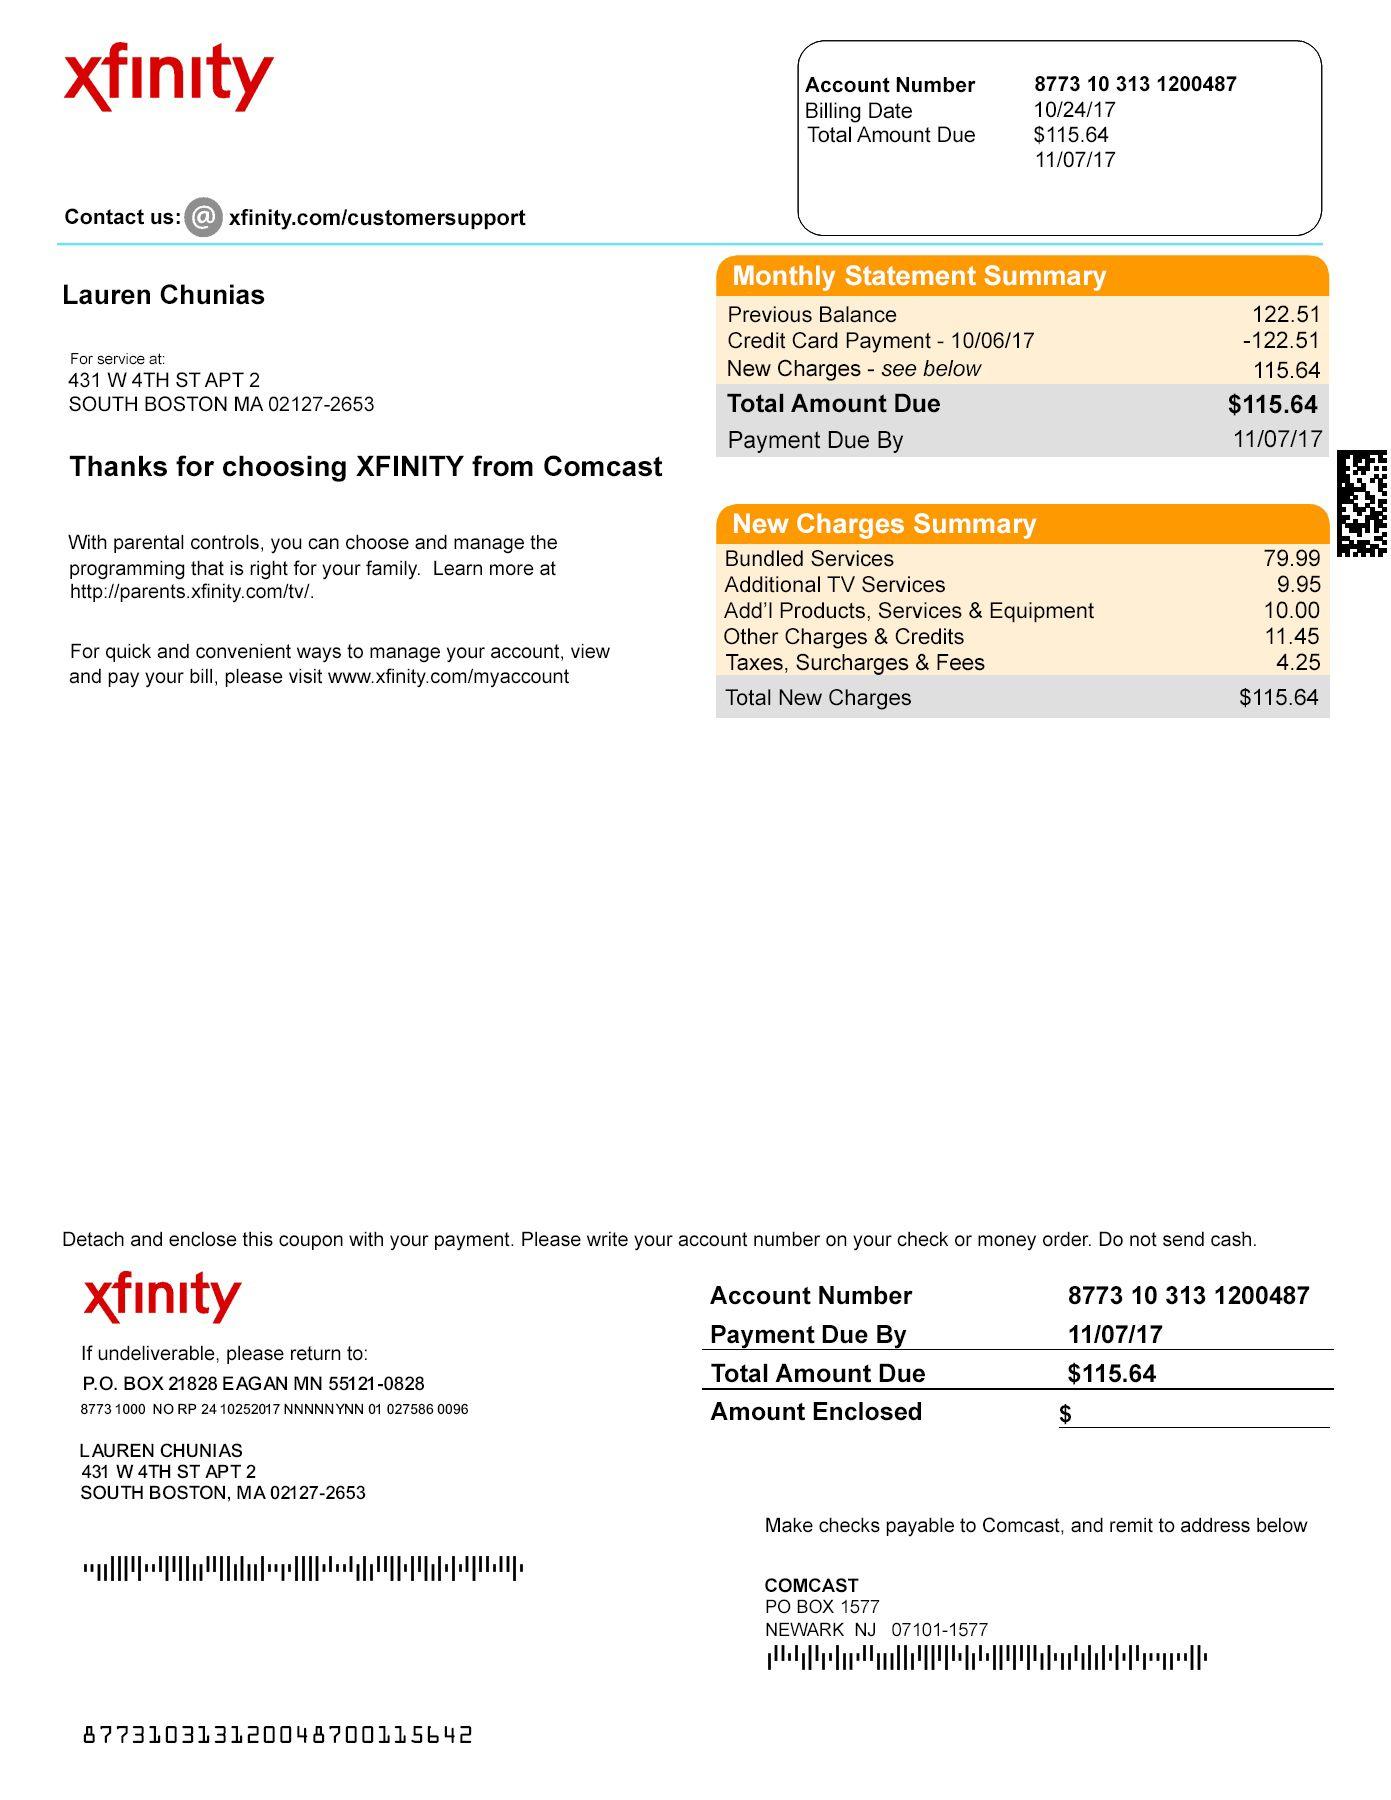 Usa Xfinity Utility Bill Psd Template Bill Template Utility Bill Payroll Template